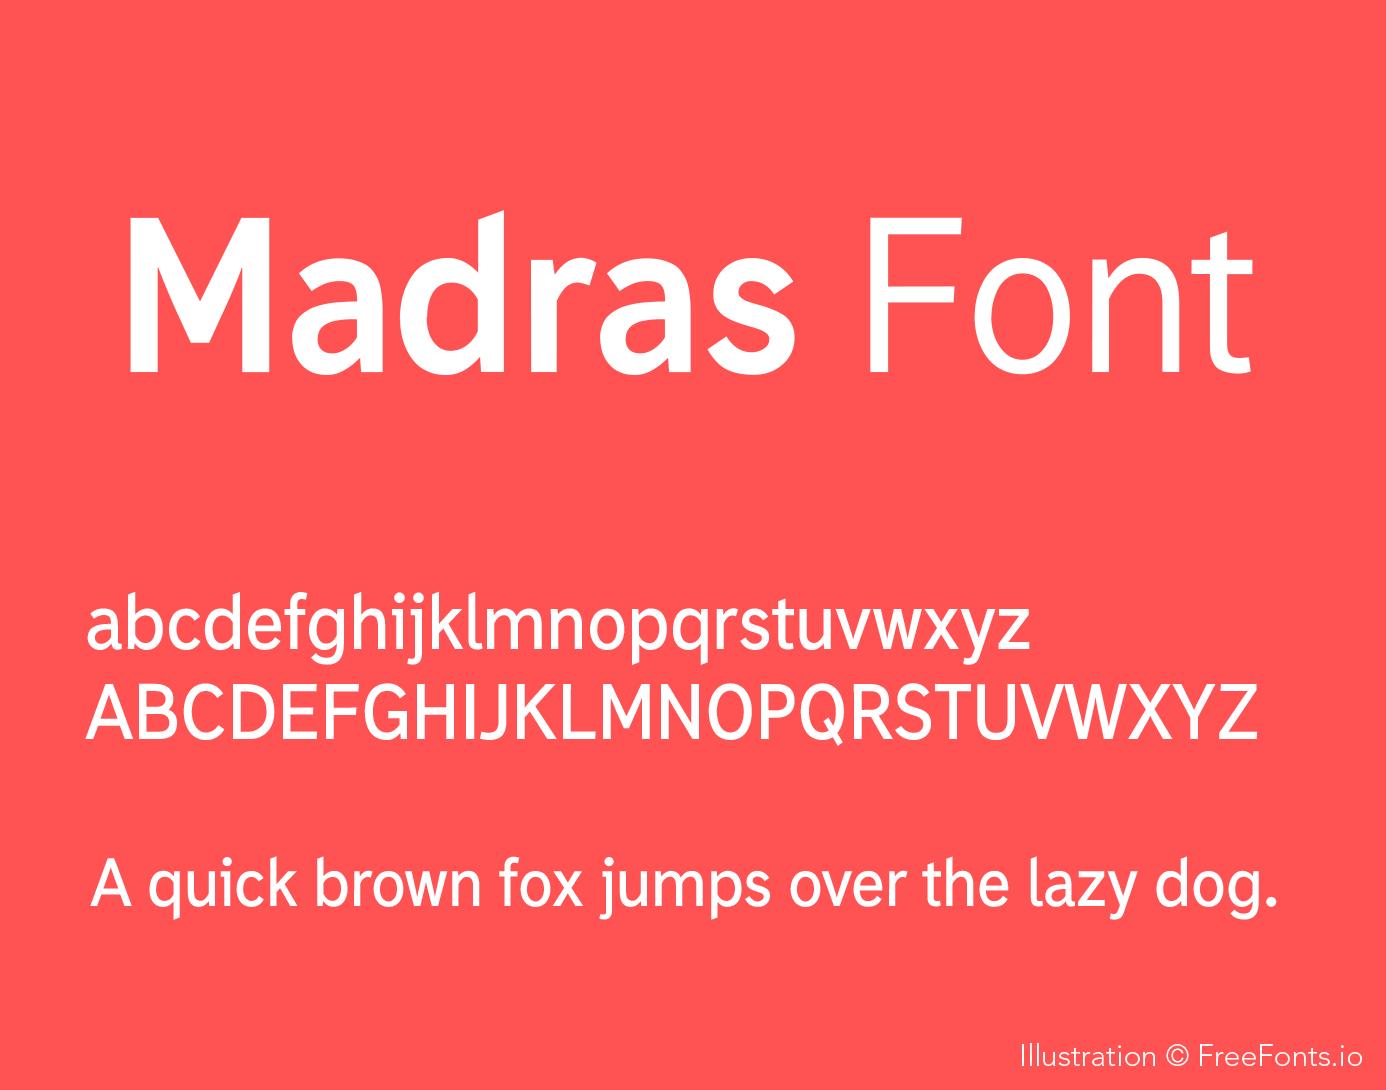 madras-font